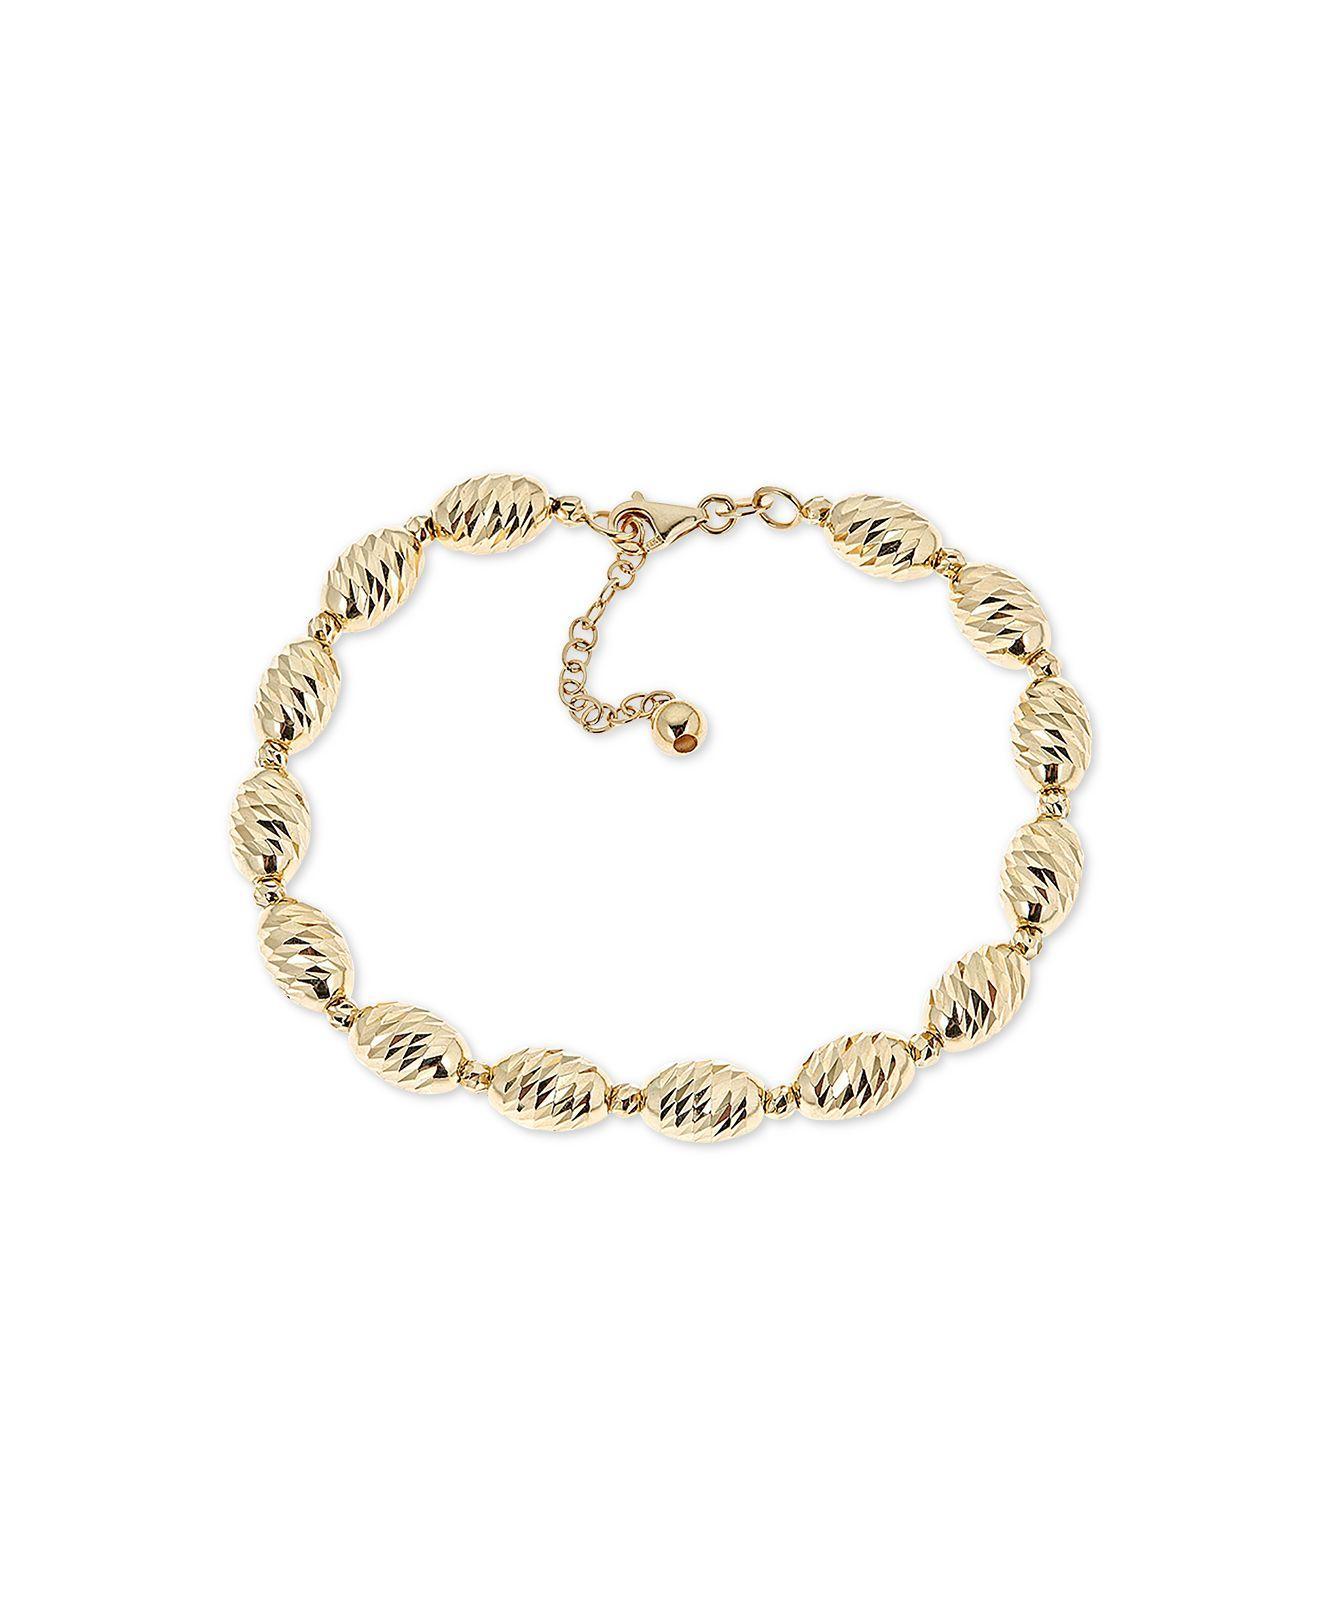 6d95cfc7b0bed4 Macy's - Metallic Textured Bead Link Bracelet In 14k Gold - Lyst. View  fullscreen